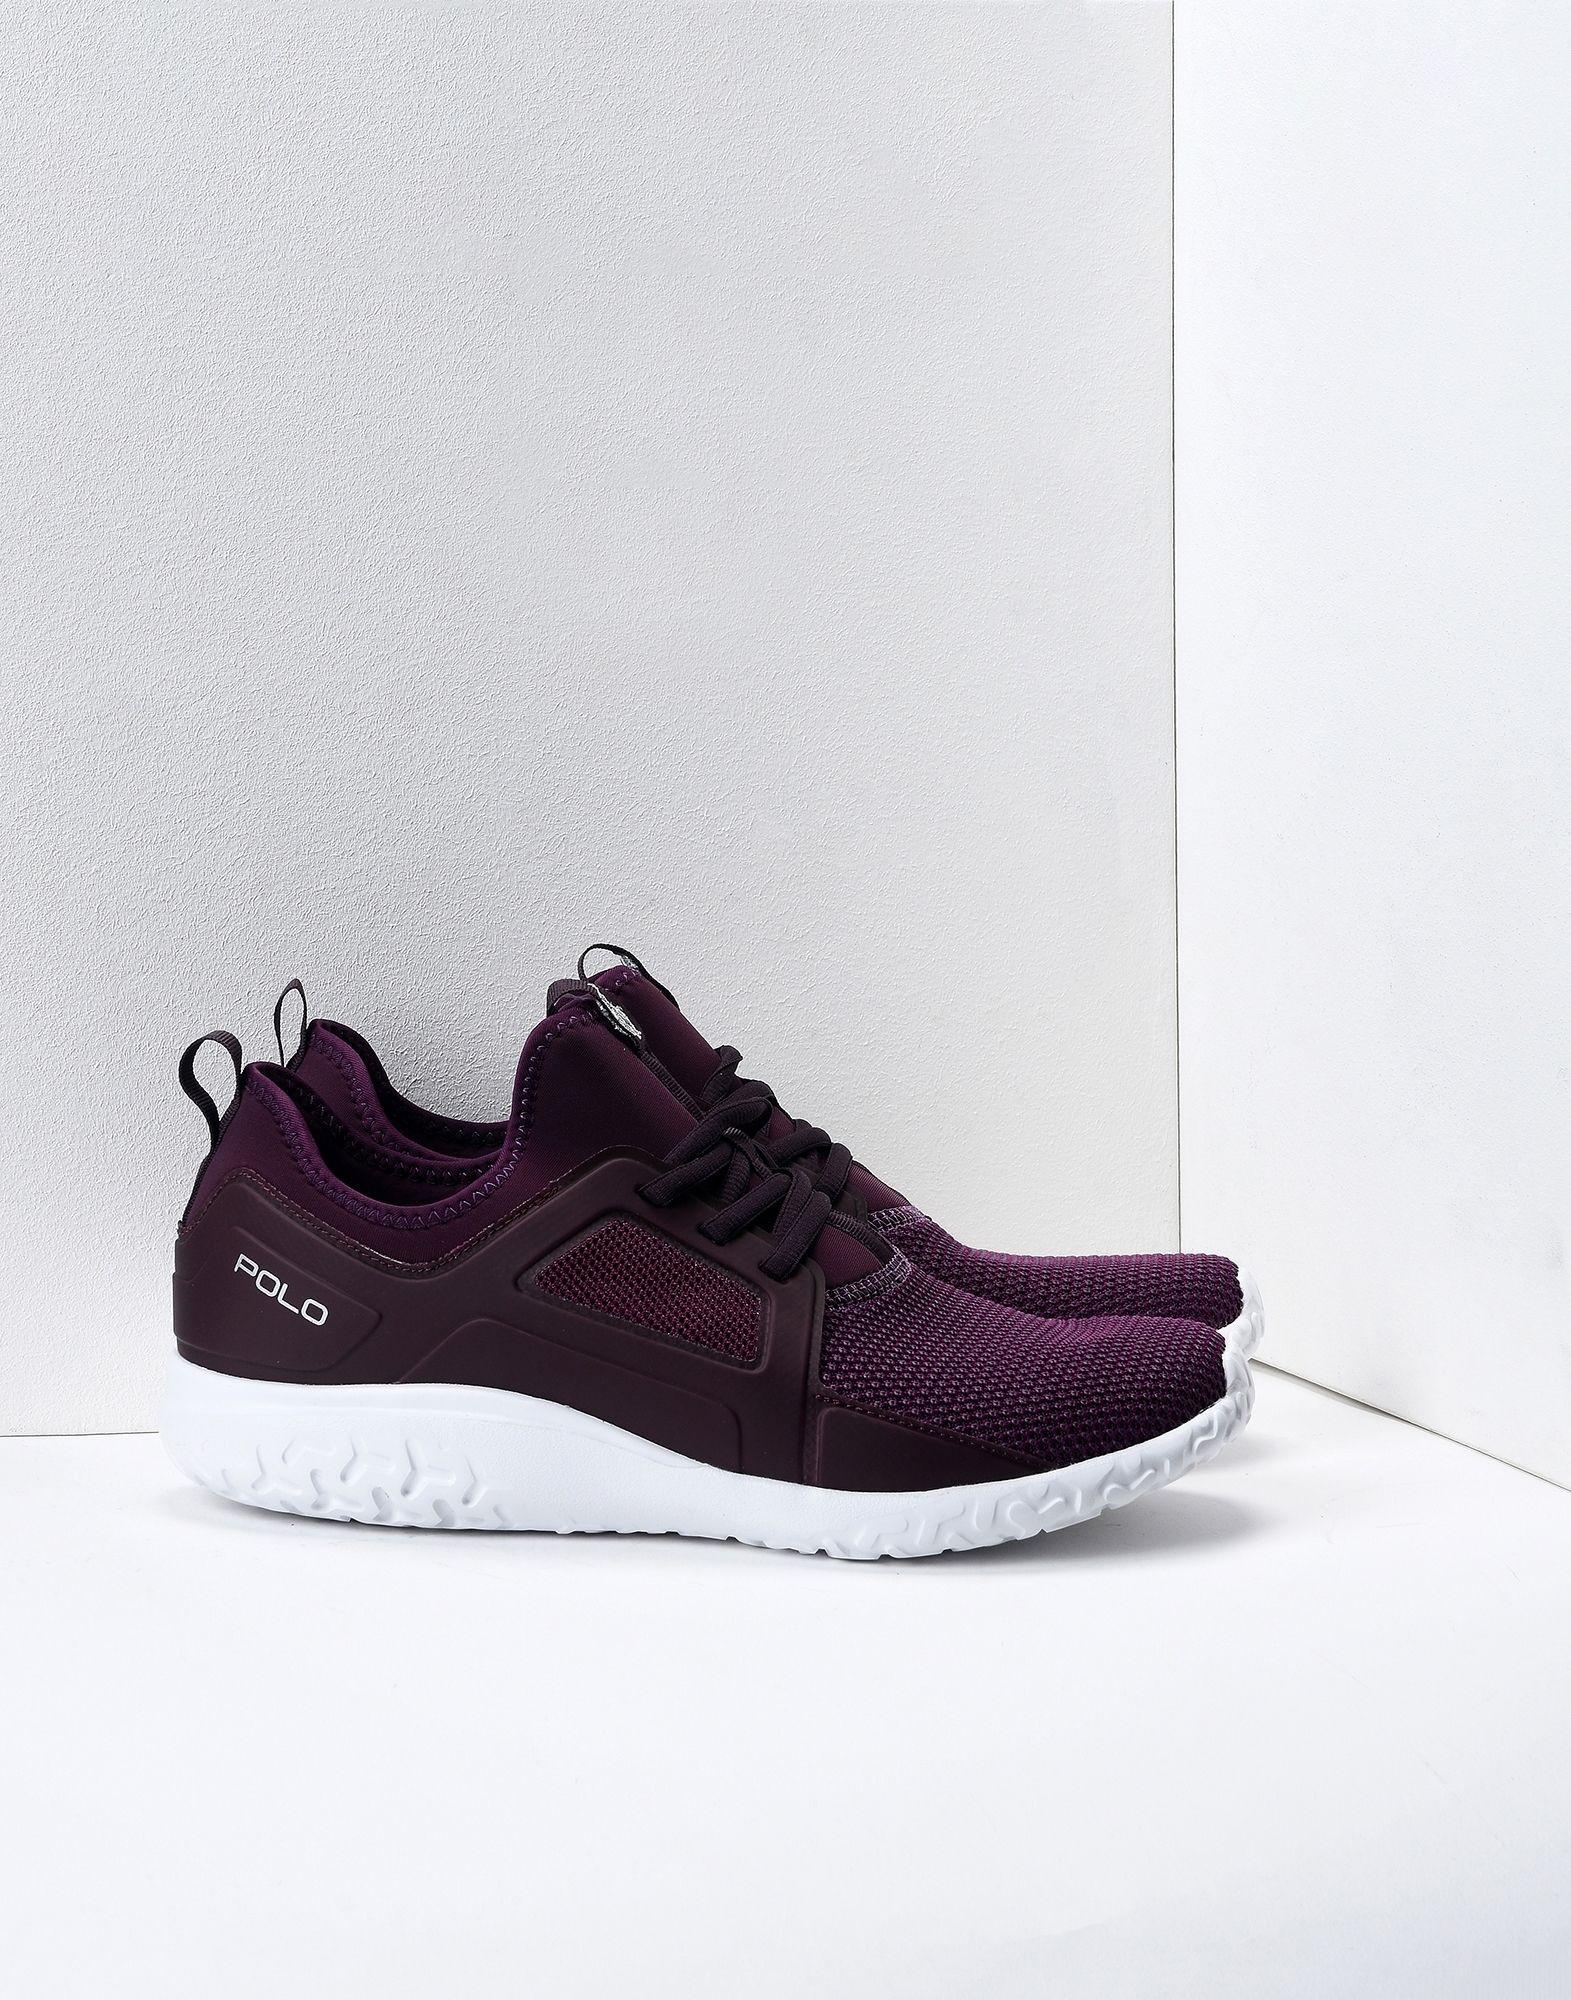 Polo Ralph Lauren 11455411MO Sneakers Damen  11455411MO Lauren Neue Schuhe f1bce4